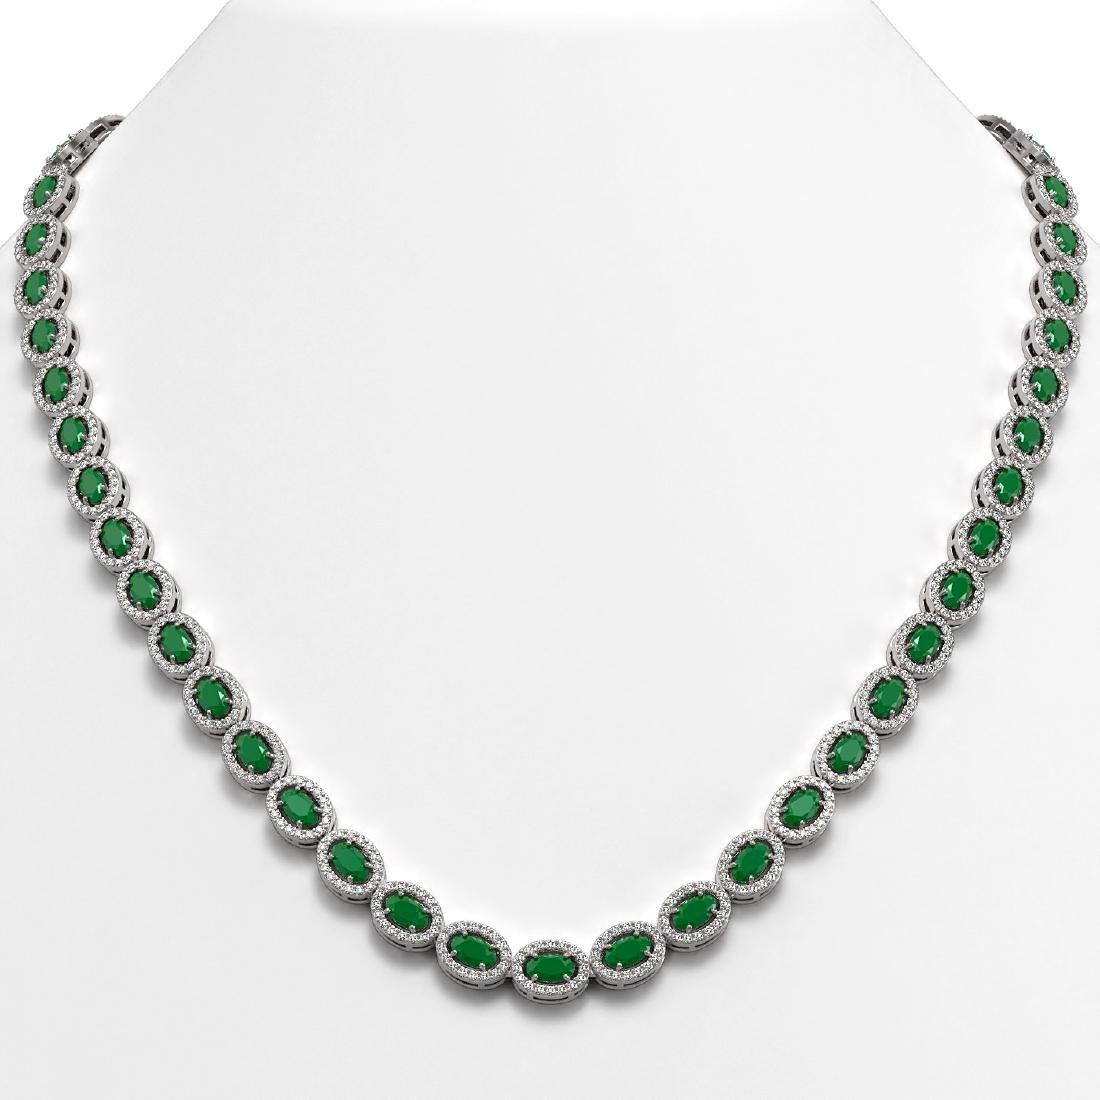 26.38 CTW Emerald & Diamond Halo Necklace 10K White